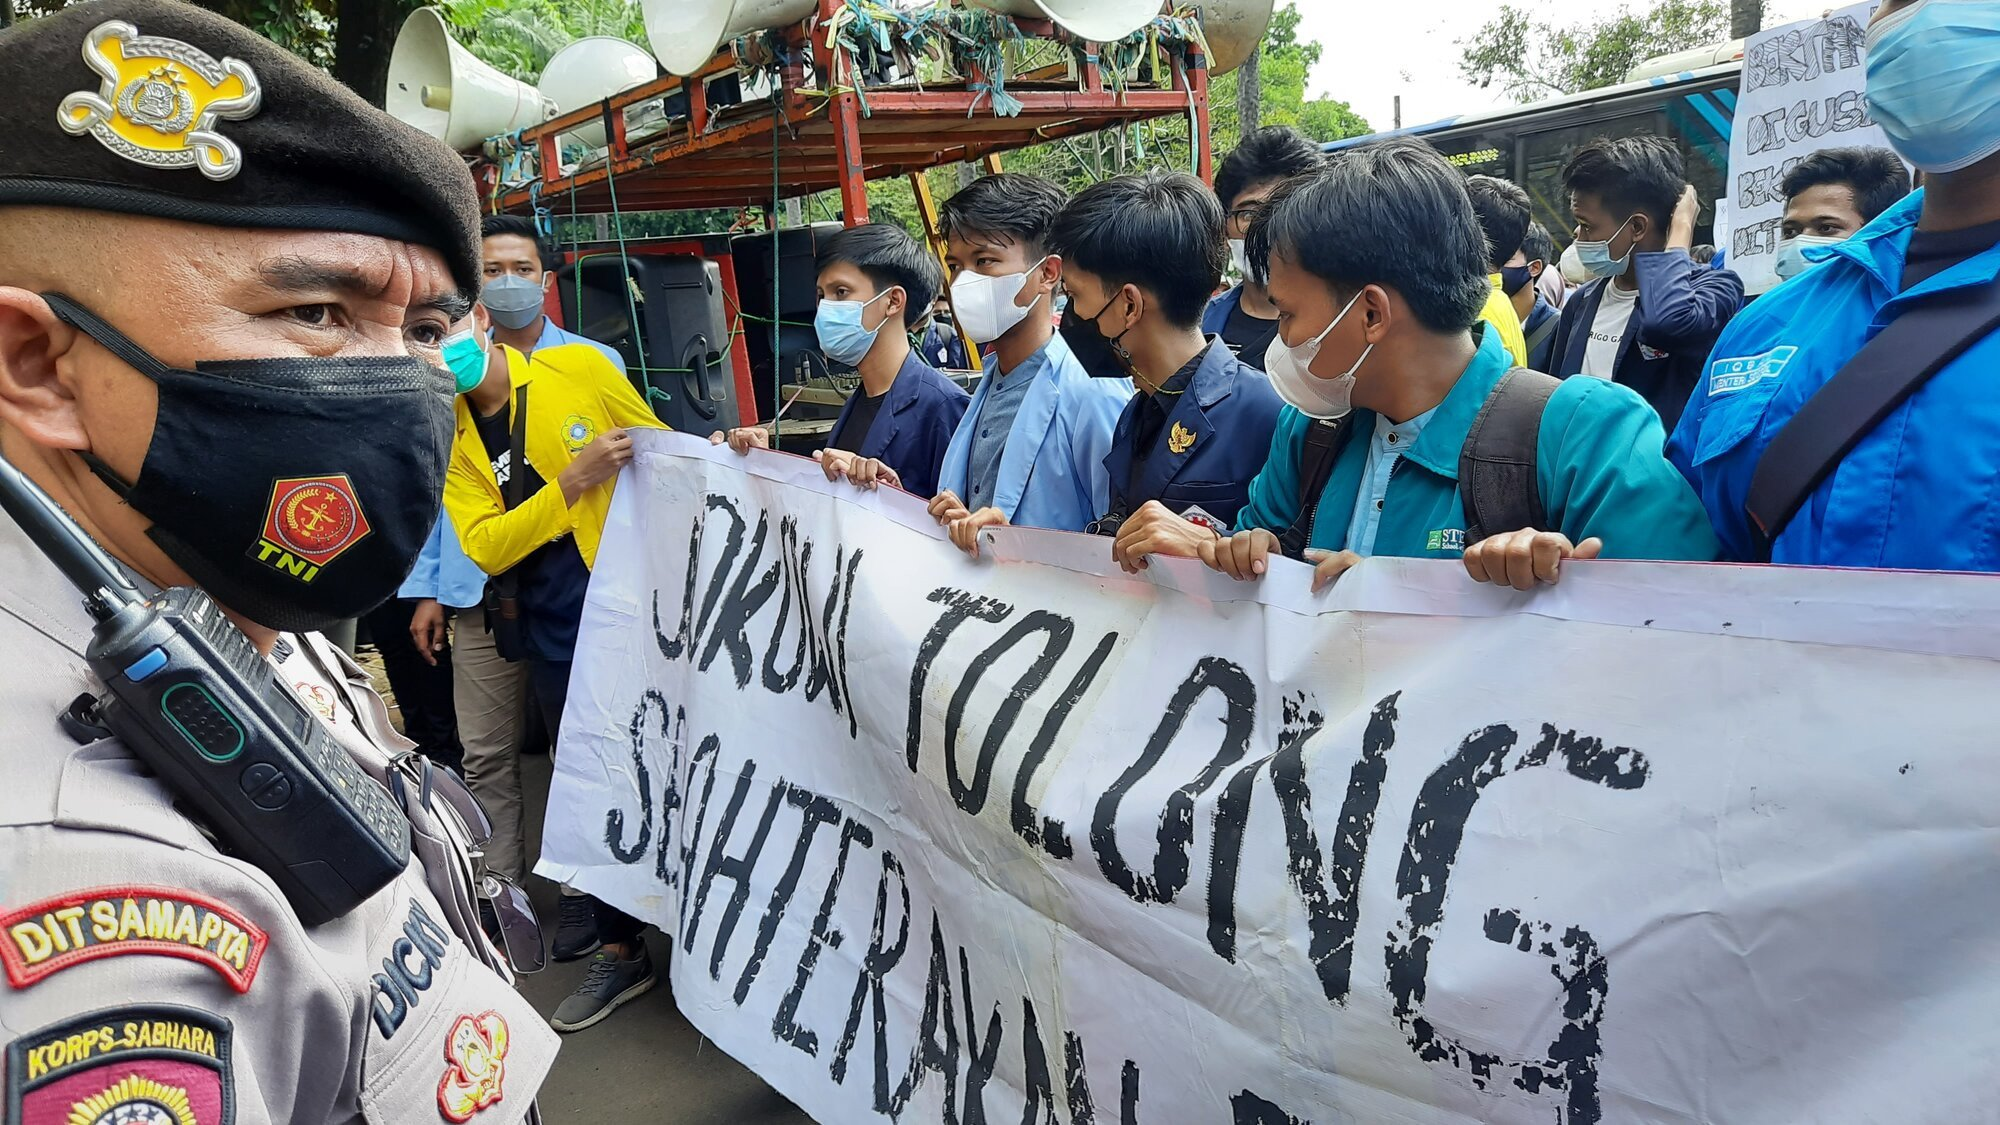 Hari Tani Nasional, BEM SI Menggelar Aksi Menyampaikan Tuntutan - JPNN.com